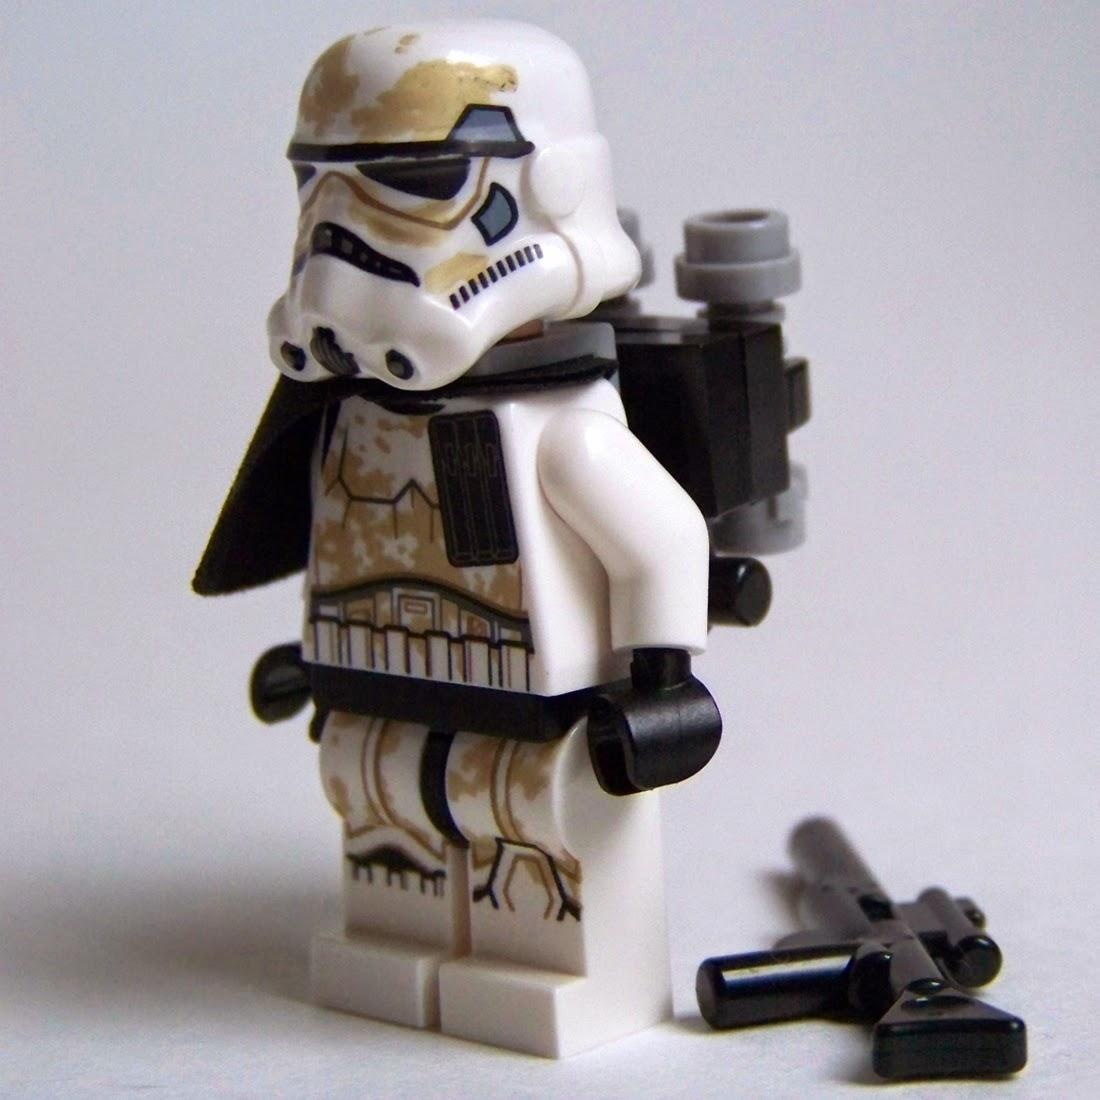 LEGO Mos Eisley Cantina Sandtrooper